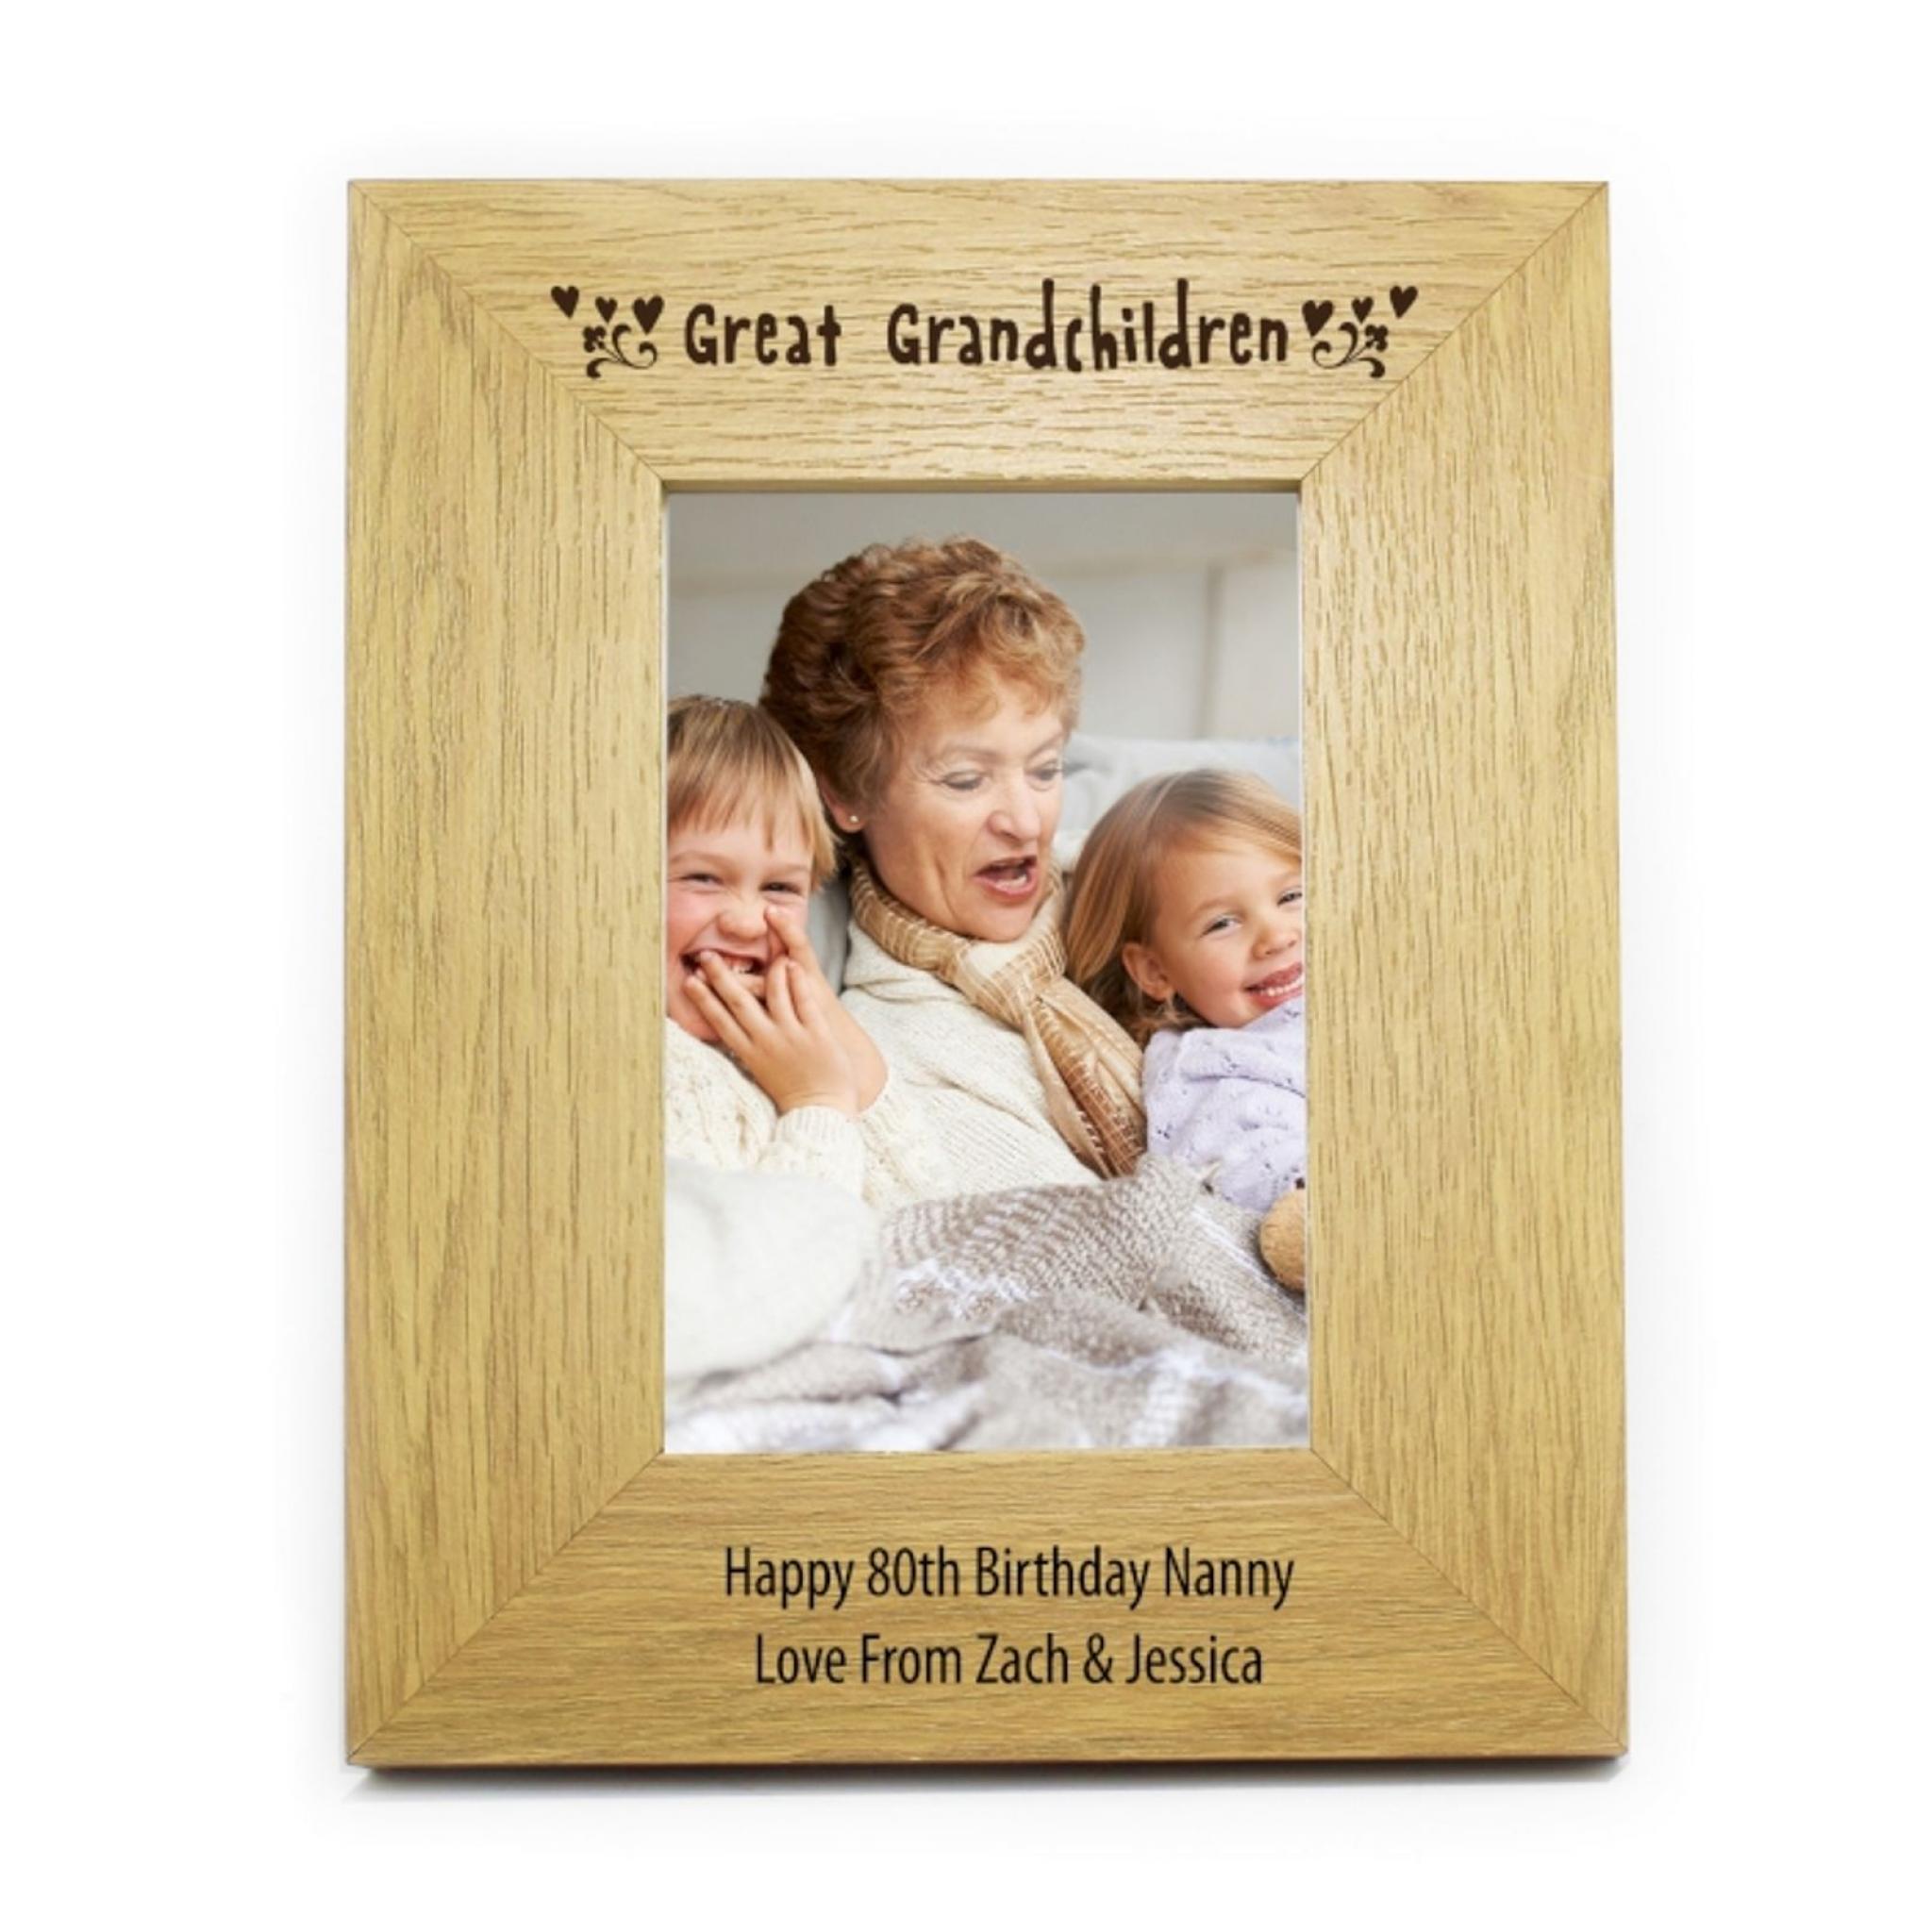 10x8 Great Grandchildren Wooden Photo Frame Personalised Personalise This Great Grandchildren